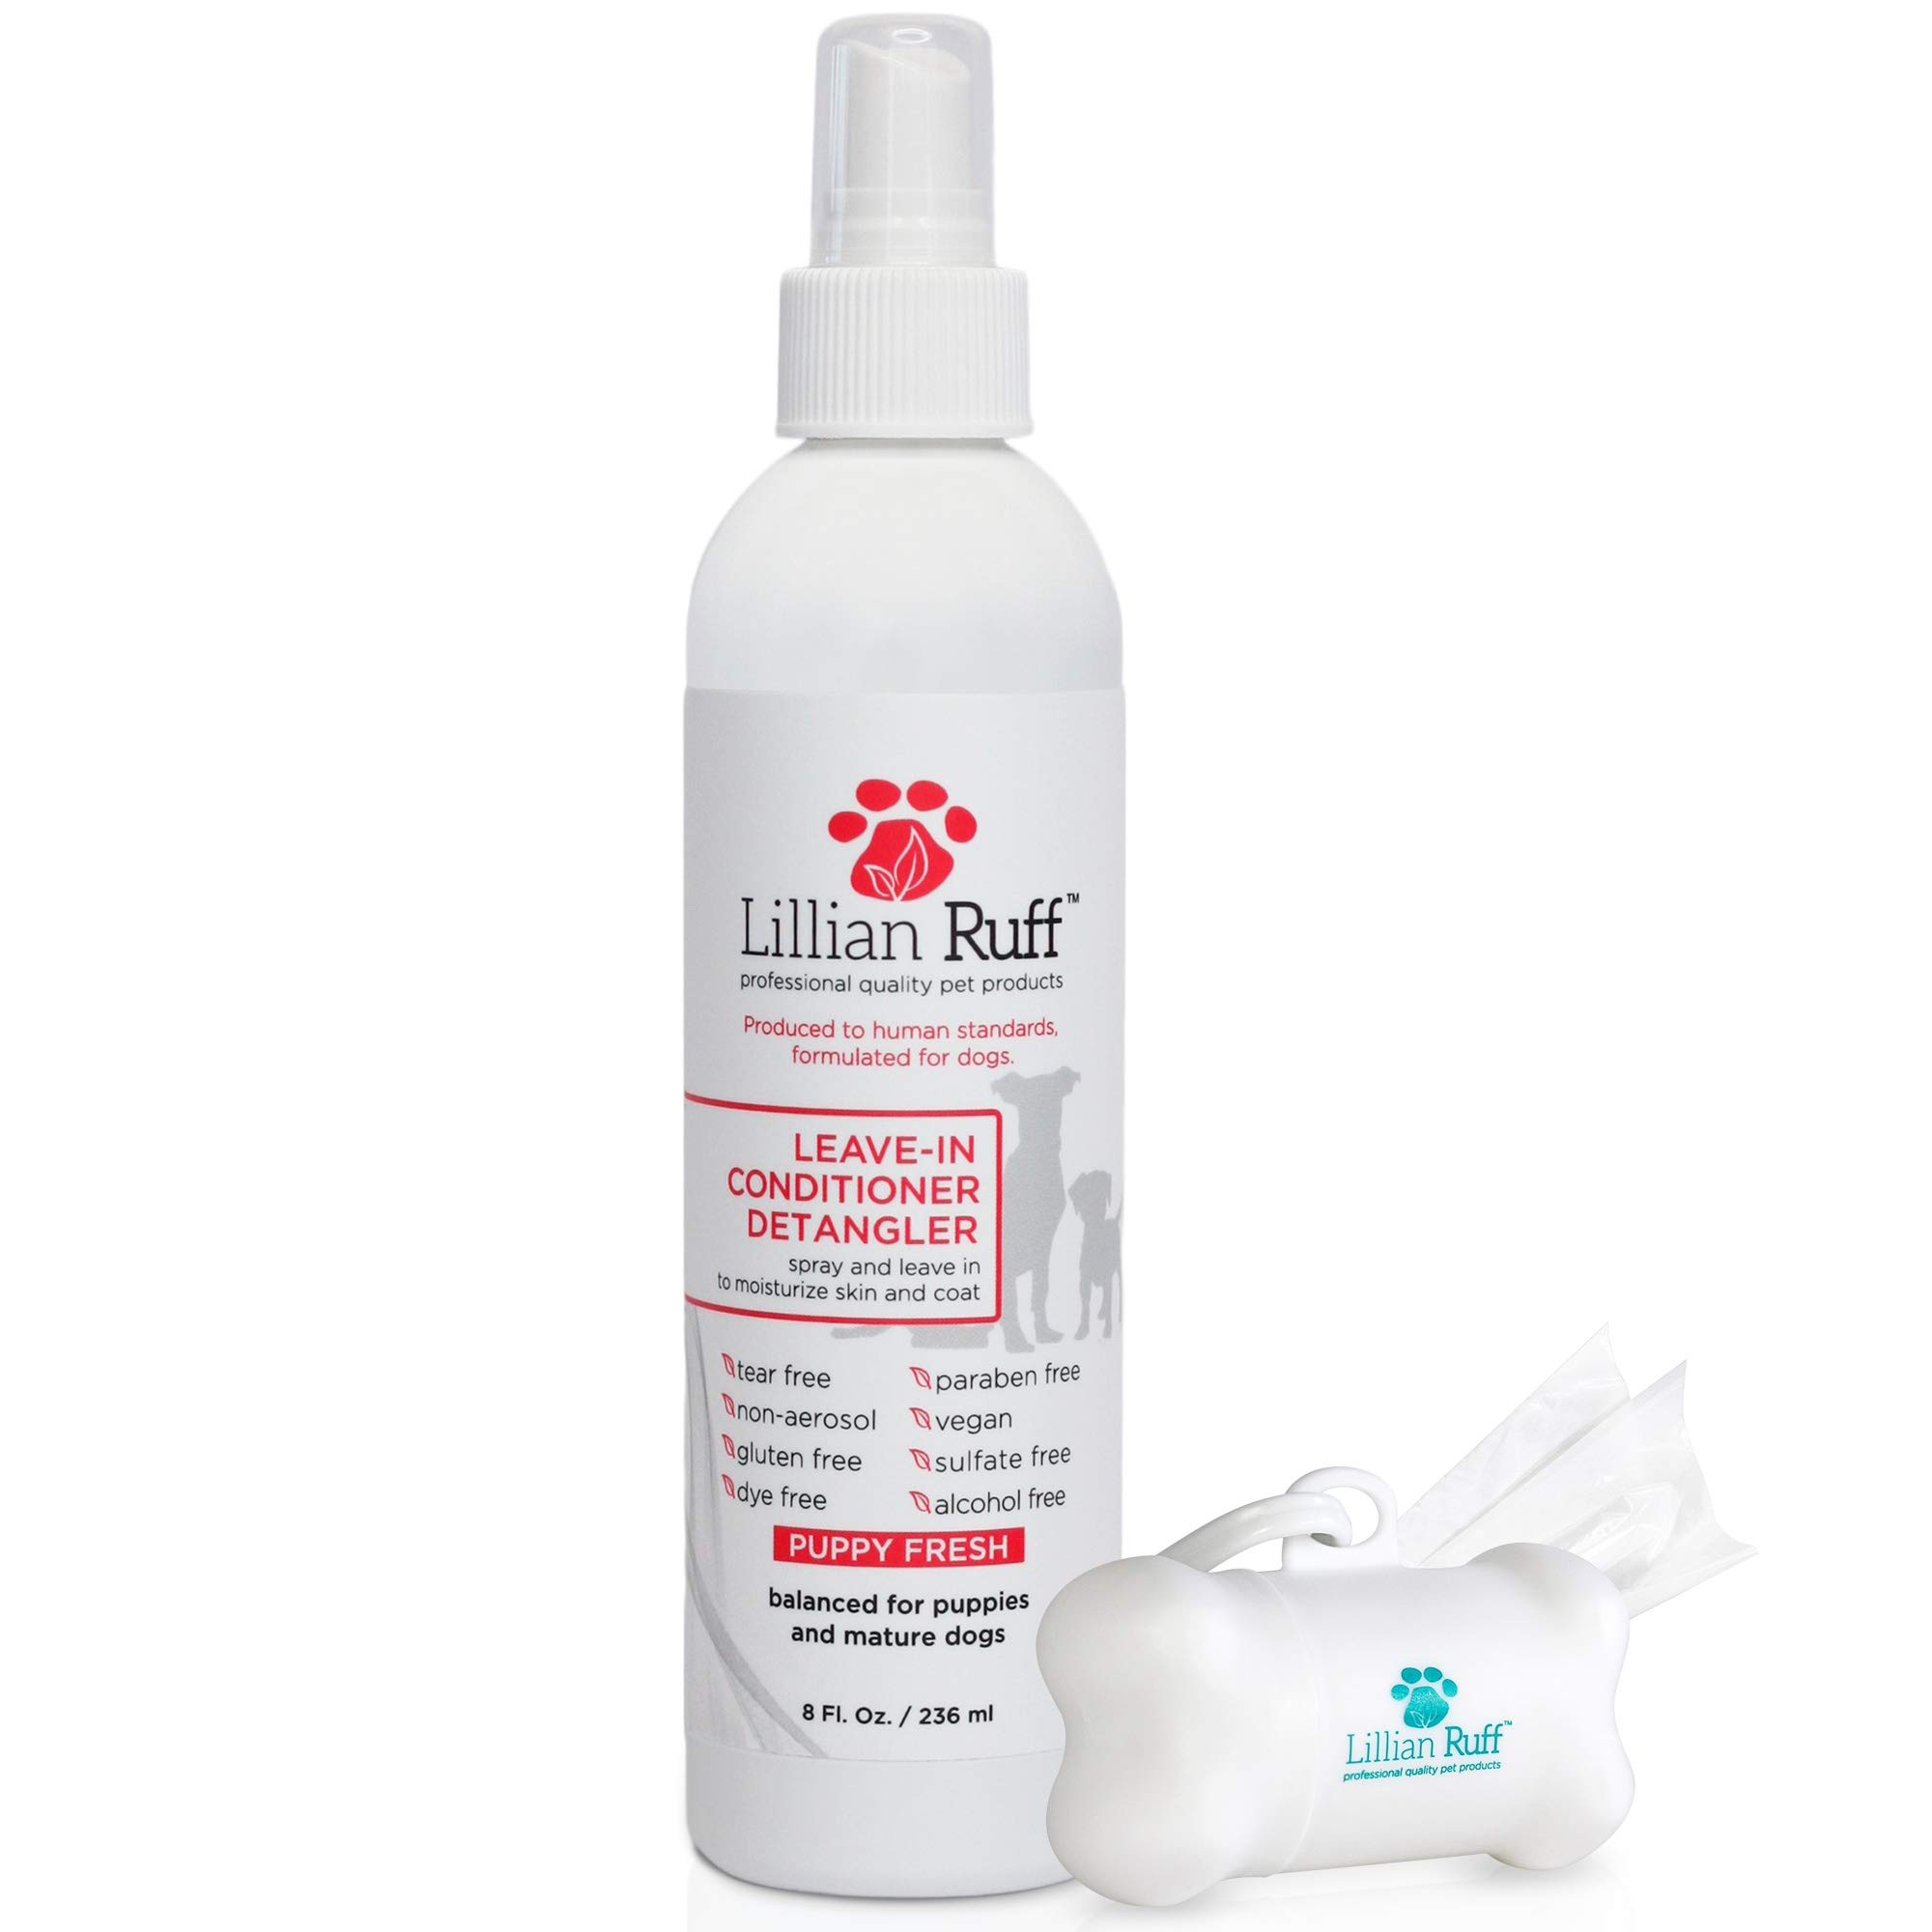 Lillian Ruff - Pet Dog Leave in Conditioner & Detangler Treatment Spray 8oz - Moisturizer Normal, Dry & Sensitive Skin - Made In The USA (8oz)